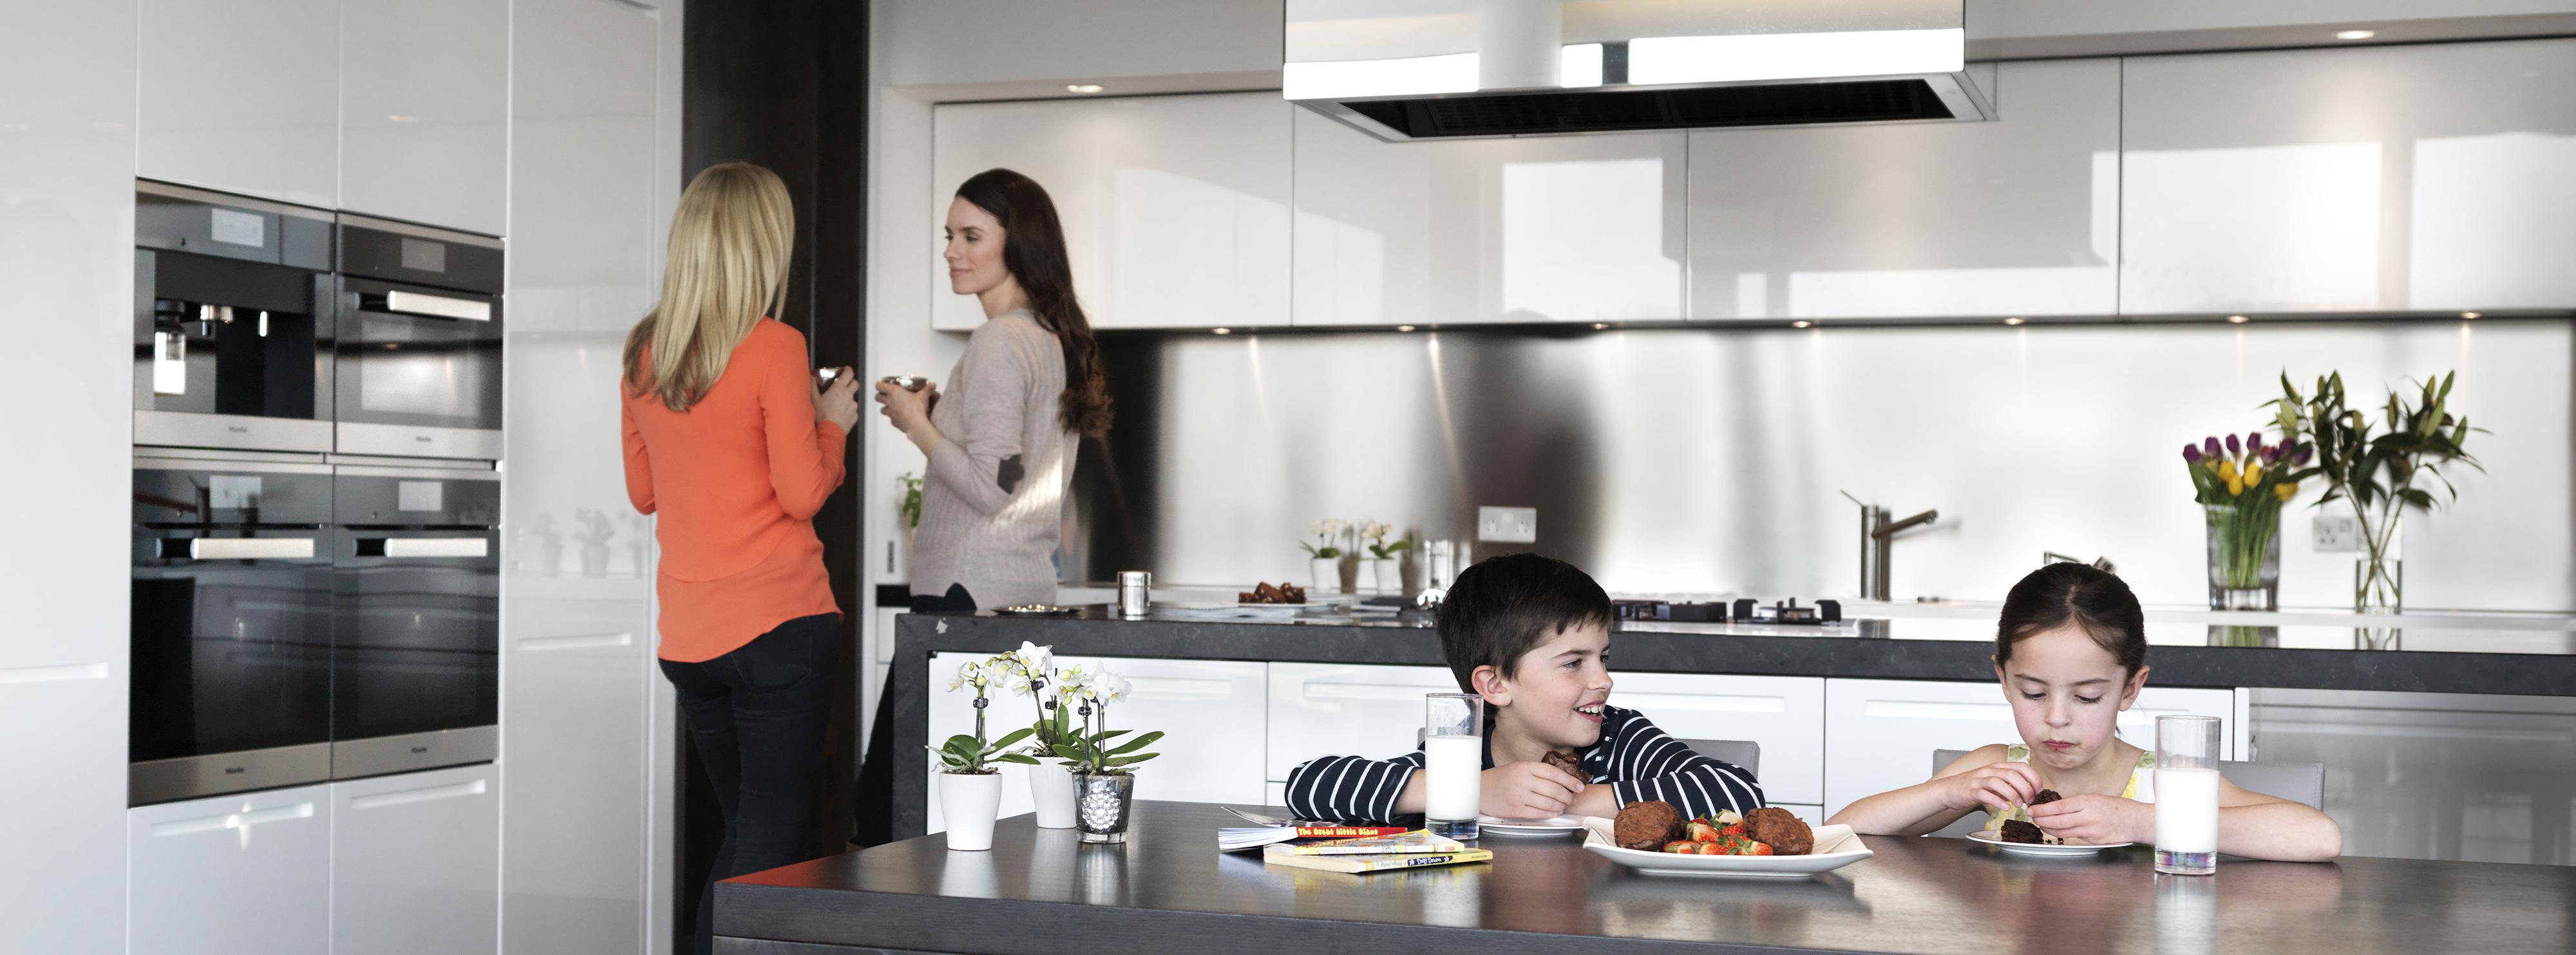 Family Kitchen Minimalist Apartment Kitchen Utsa Apartments Lease